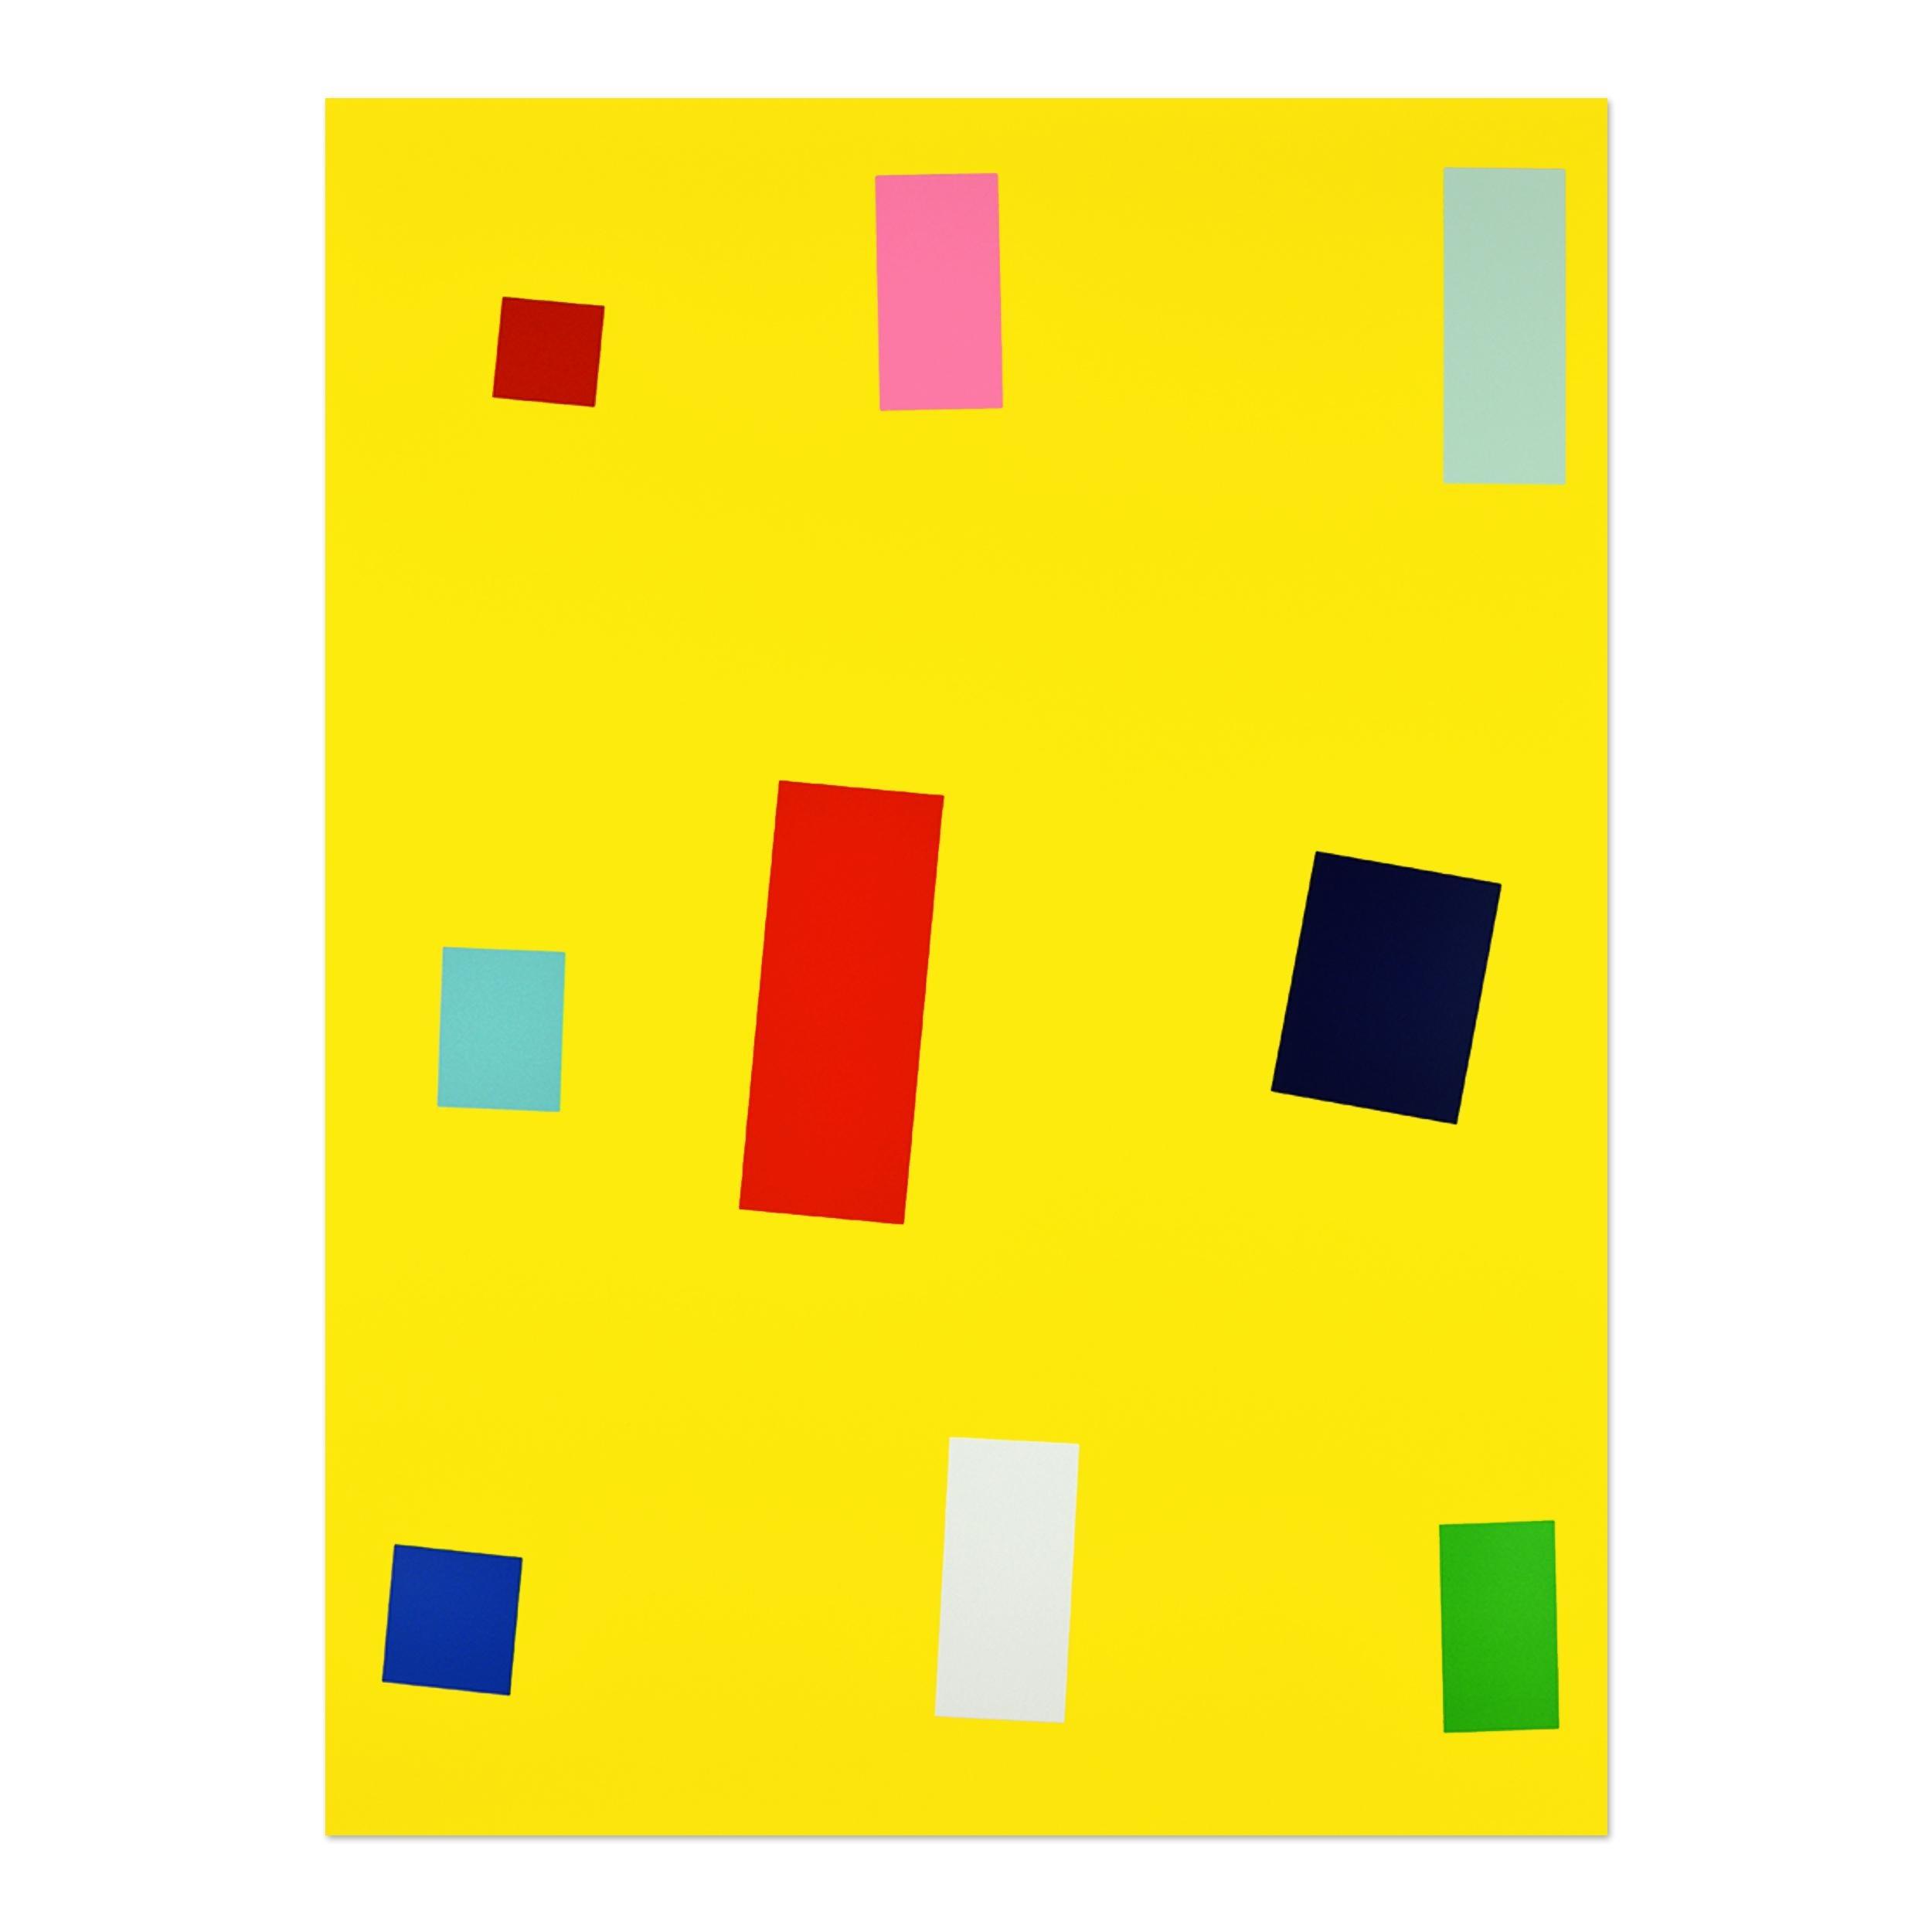 Gelbe Fahne, 1999, Abstract Art, Minimalism, 20th Century Contemporary Art